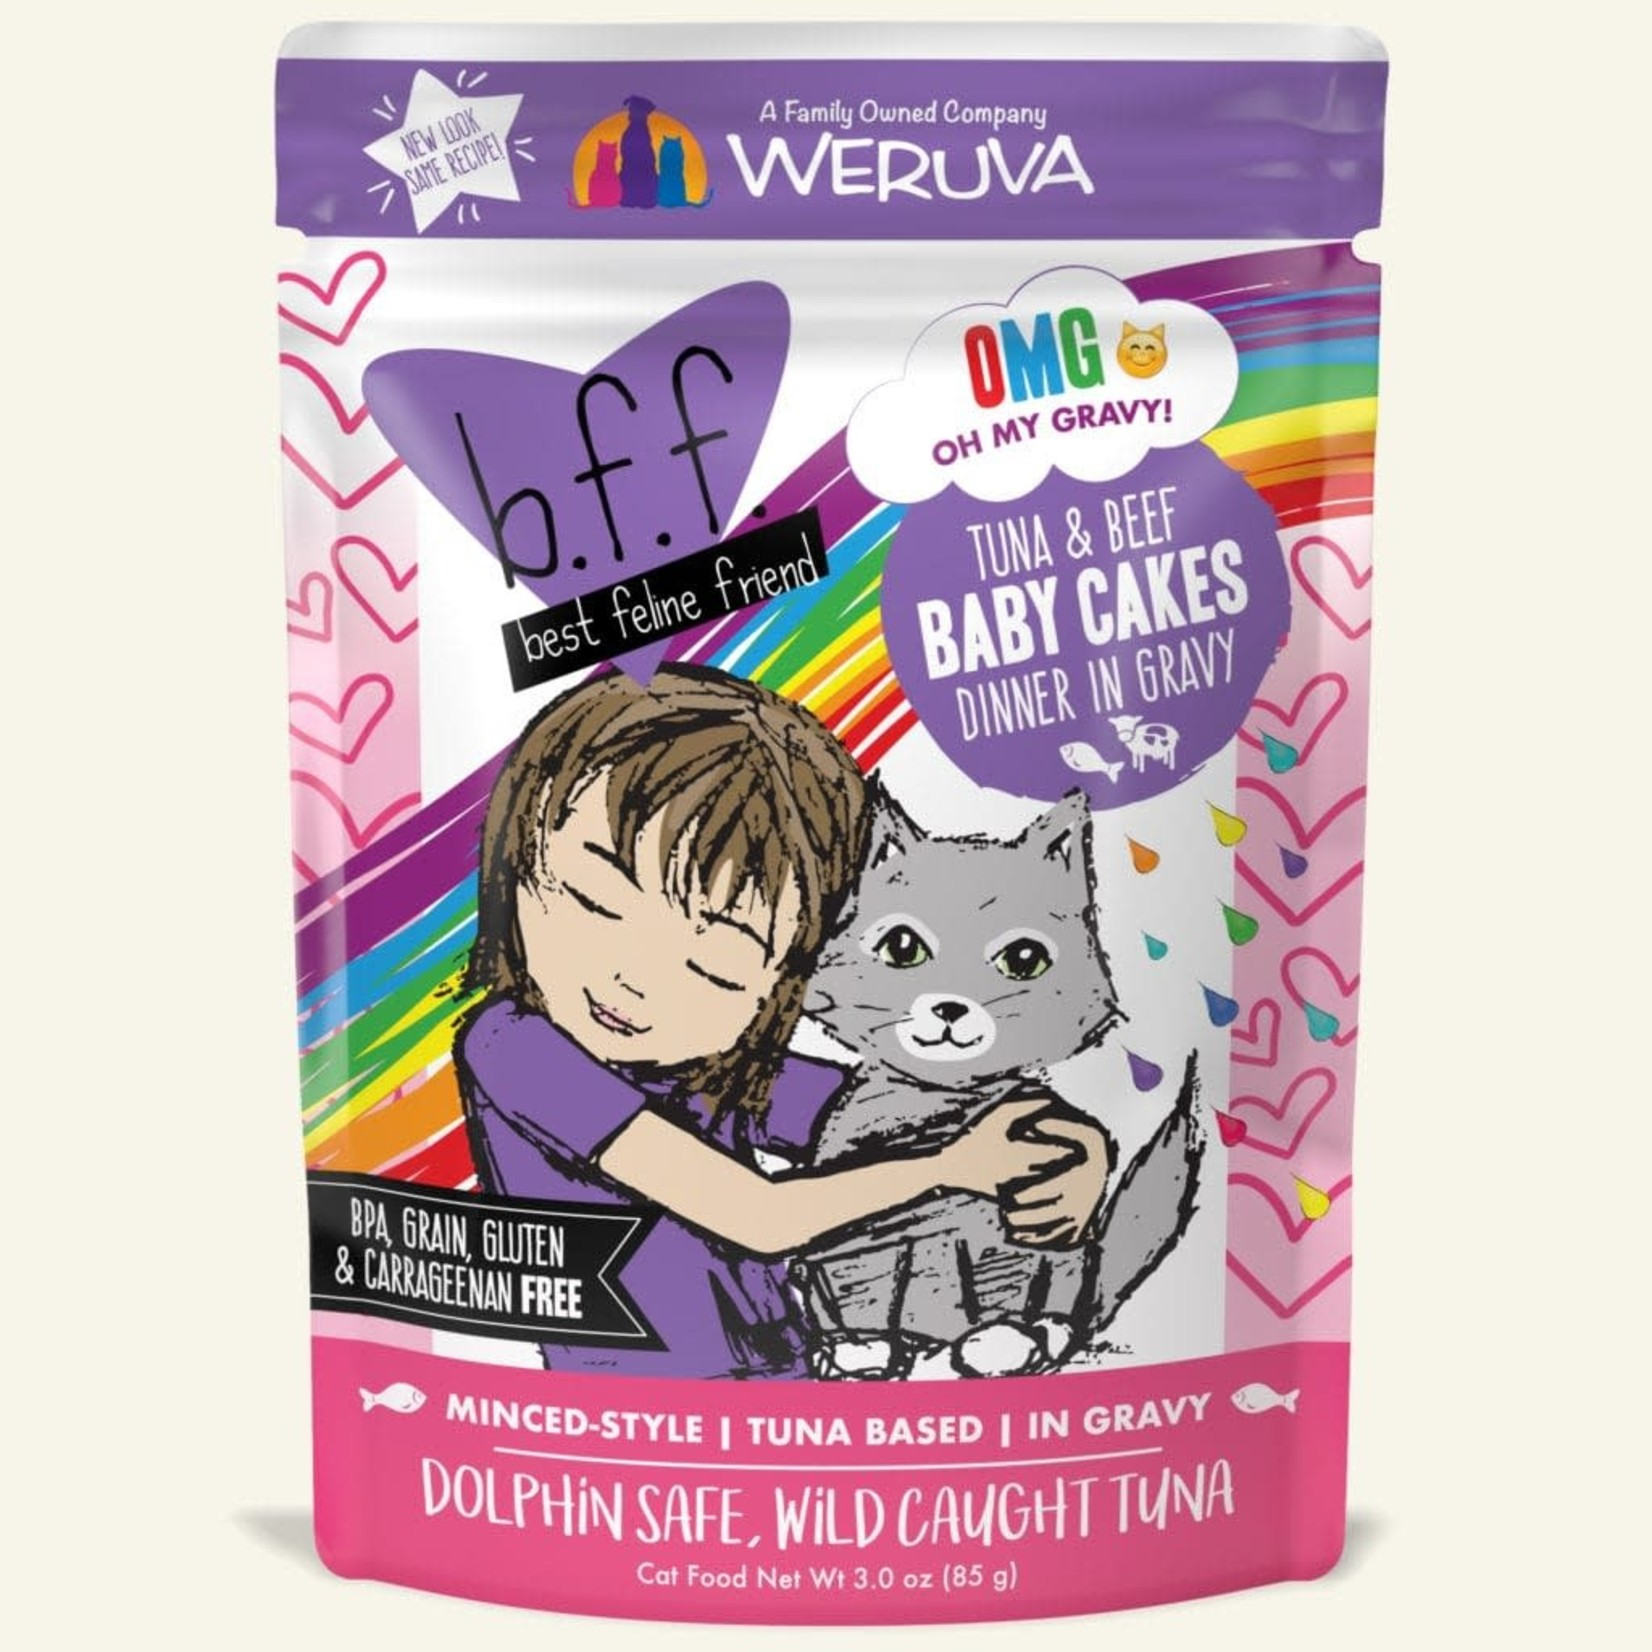 Weruva Inc. BFF OMG Cat Tuna & Beef Baby Cakes 3 OZ Pouch